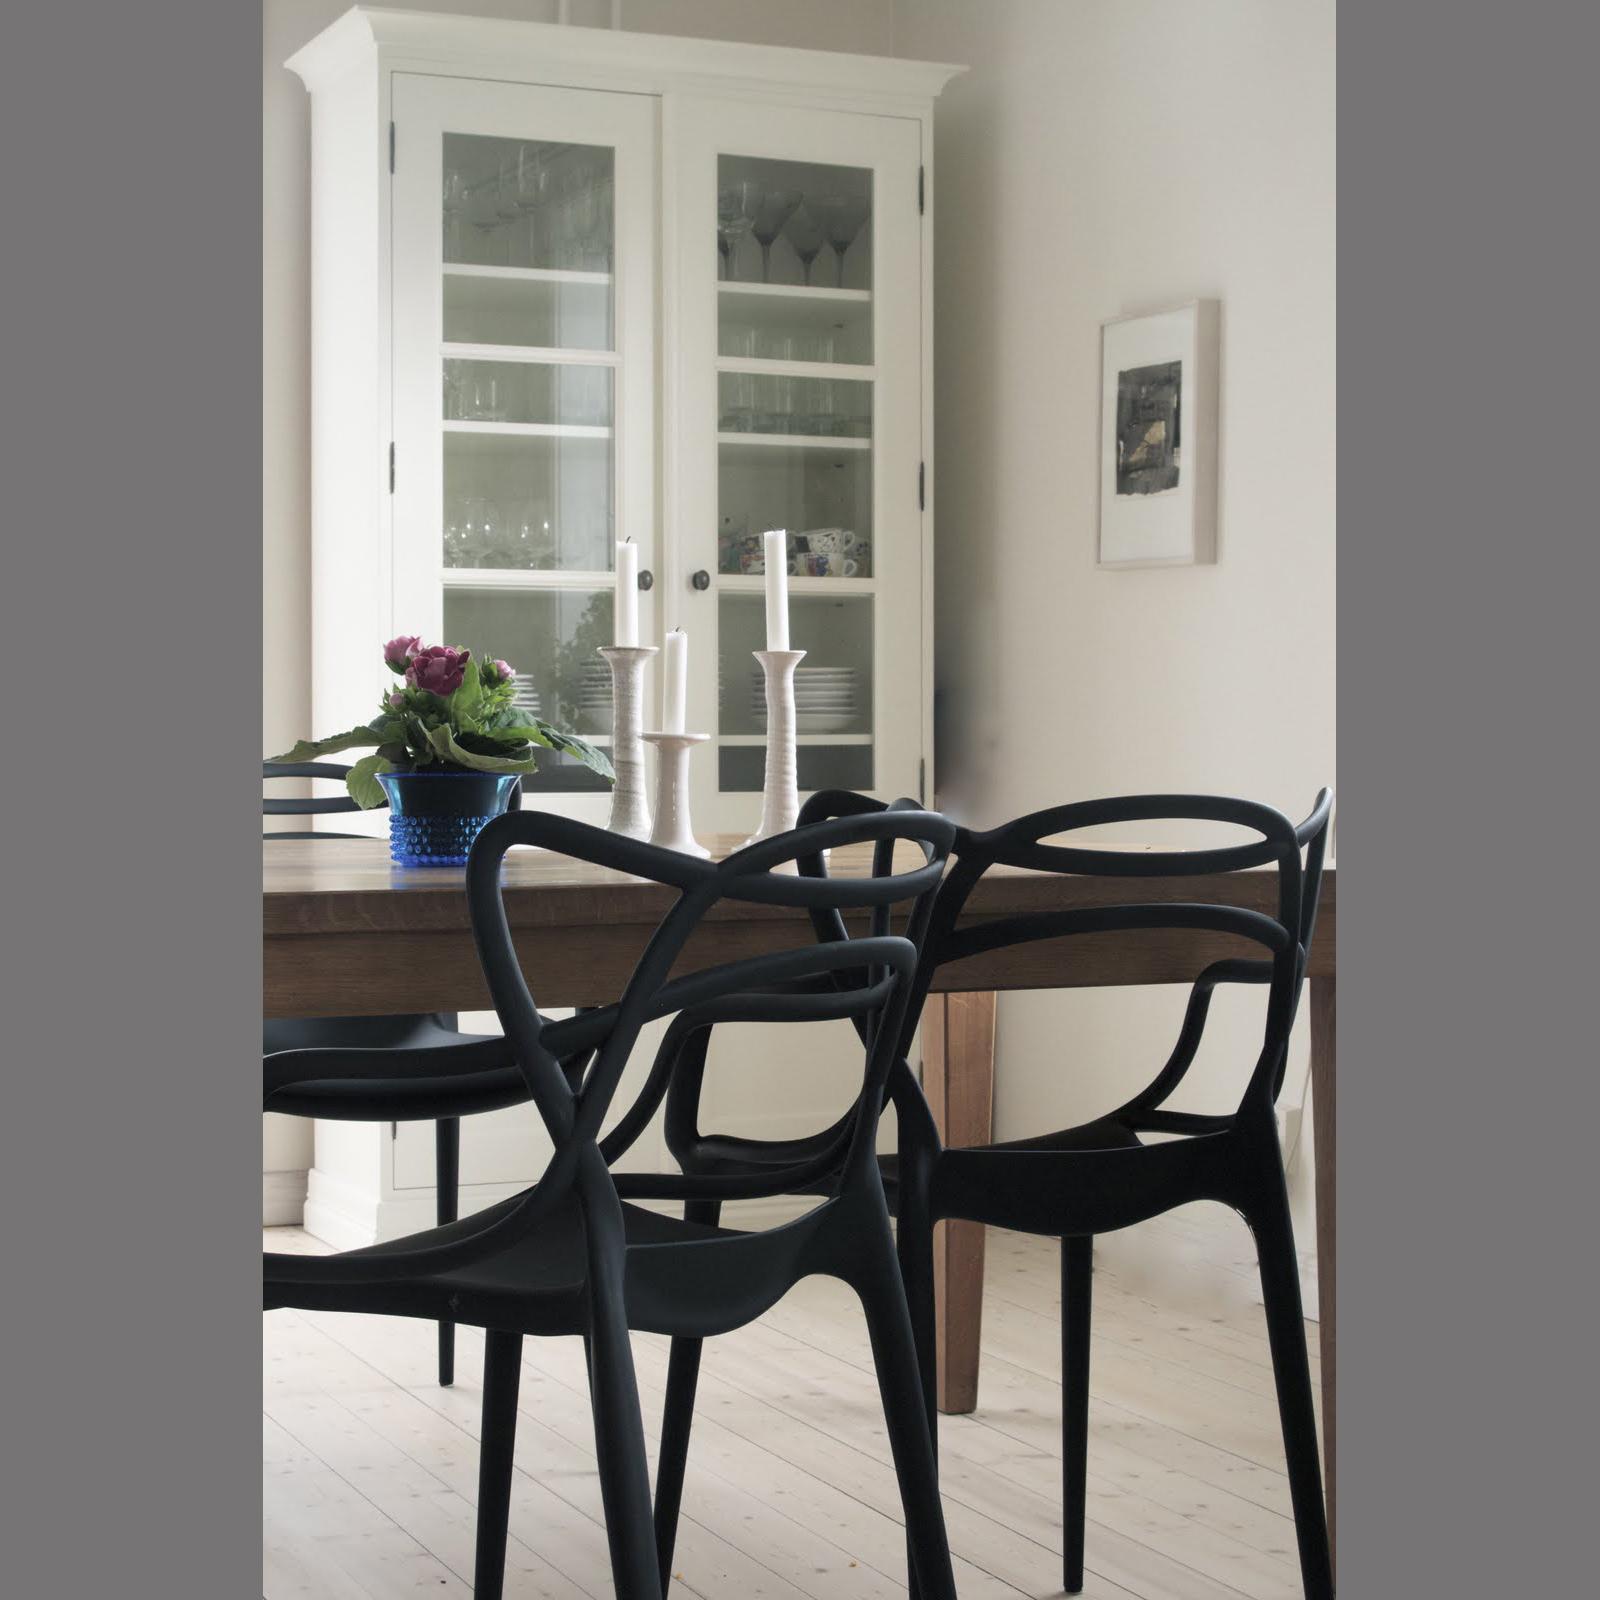 masters kartell chair. Black Bedroom Furniture Sets. Home Design Ideas